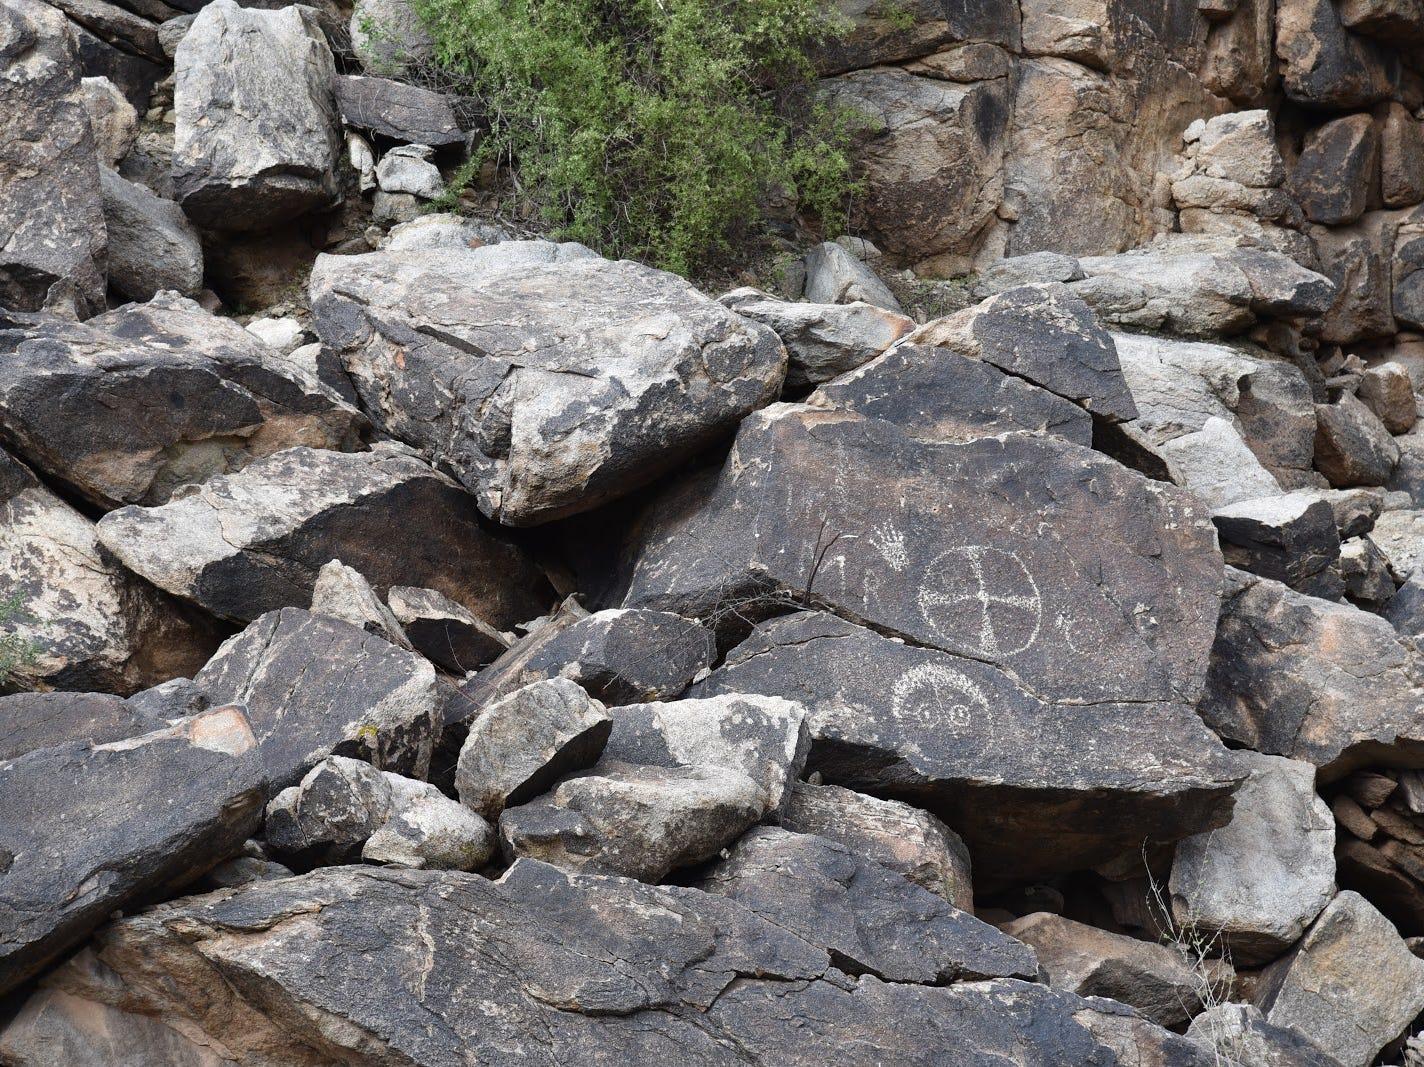 Hohokam petroglyphs are plentiful along the Kiwanis Trail.